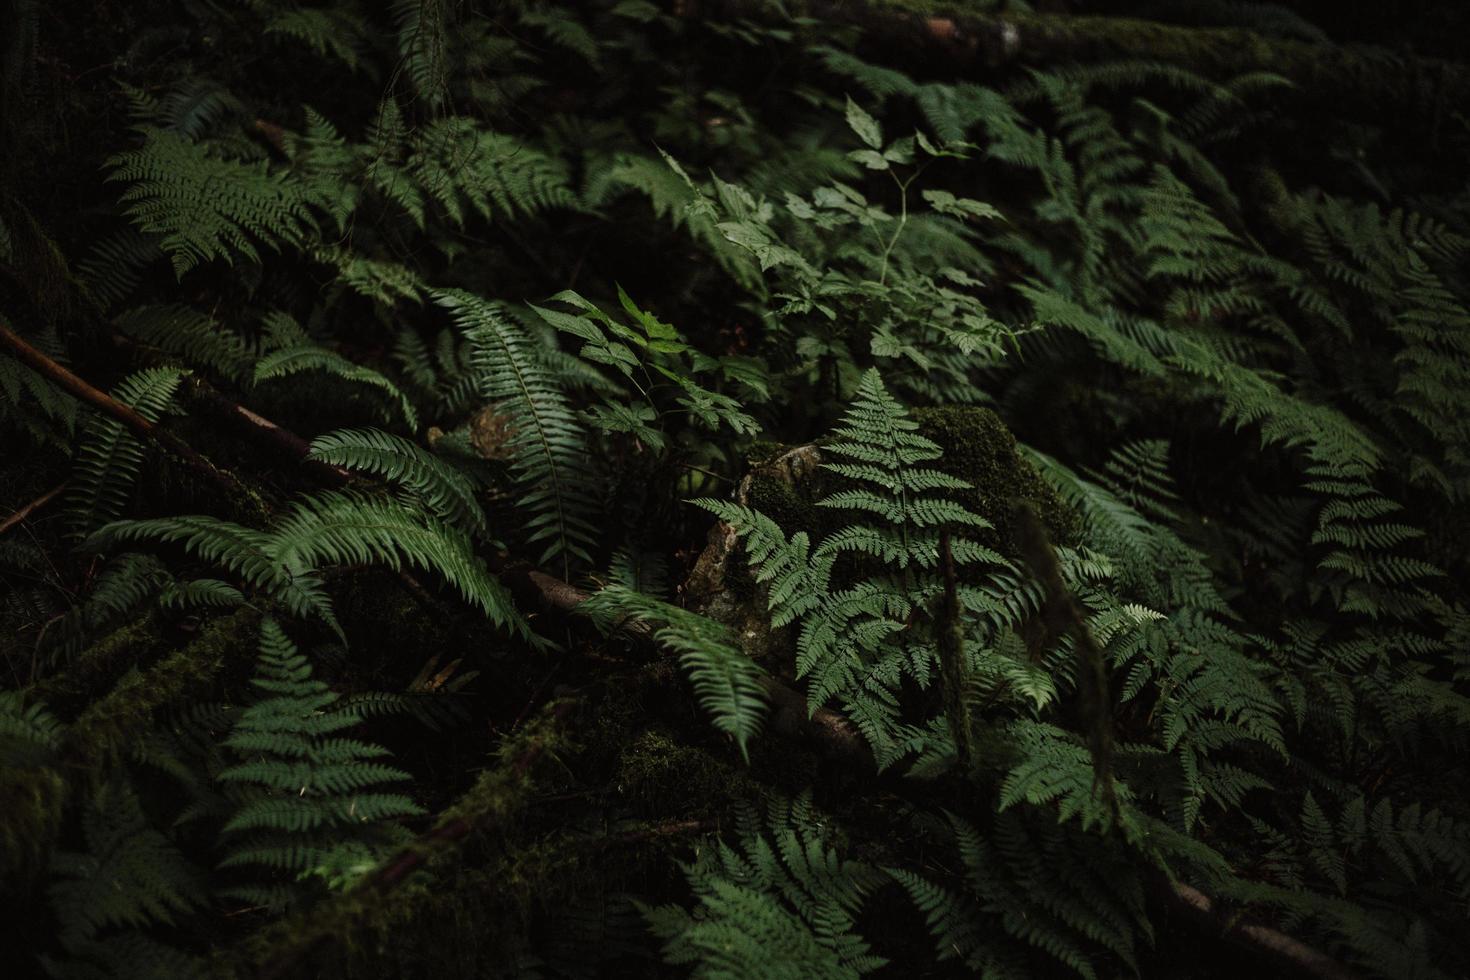 pianta di felce verde illuminata foto